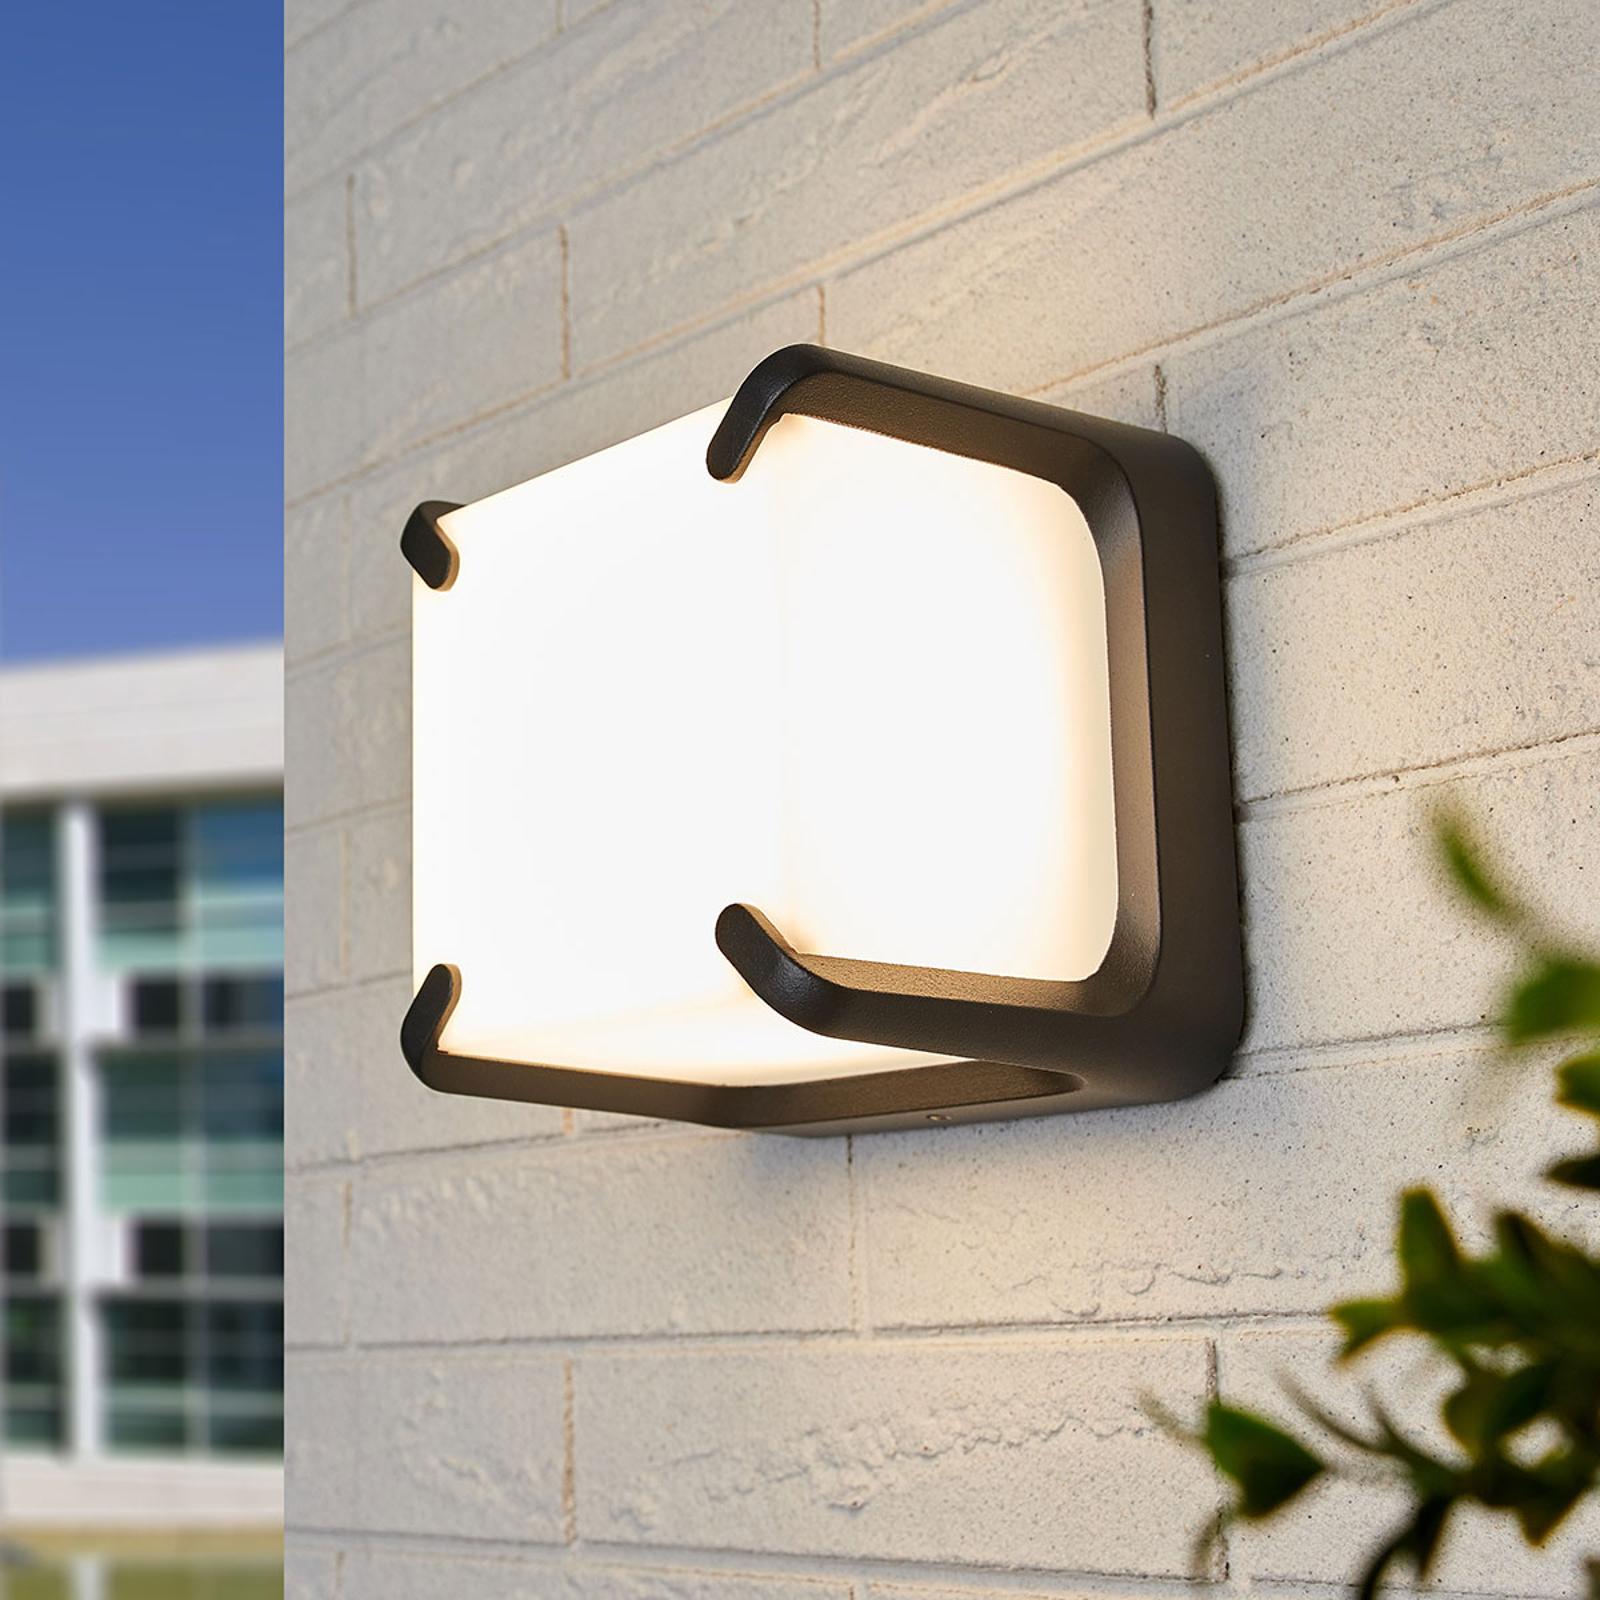 Vierkant gevormde LED outdoor wandlamp Armor